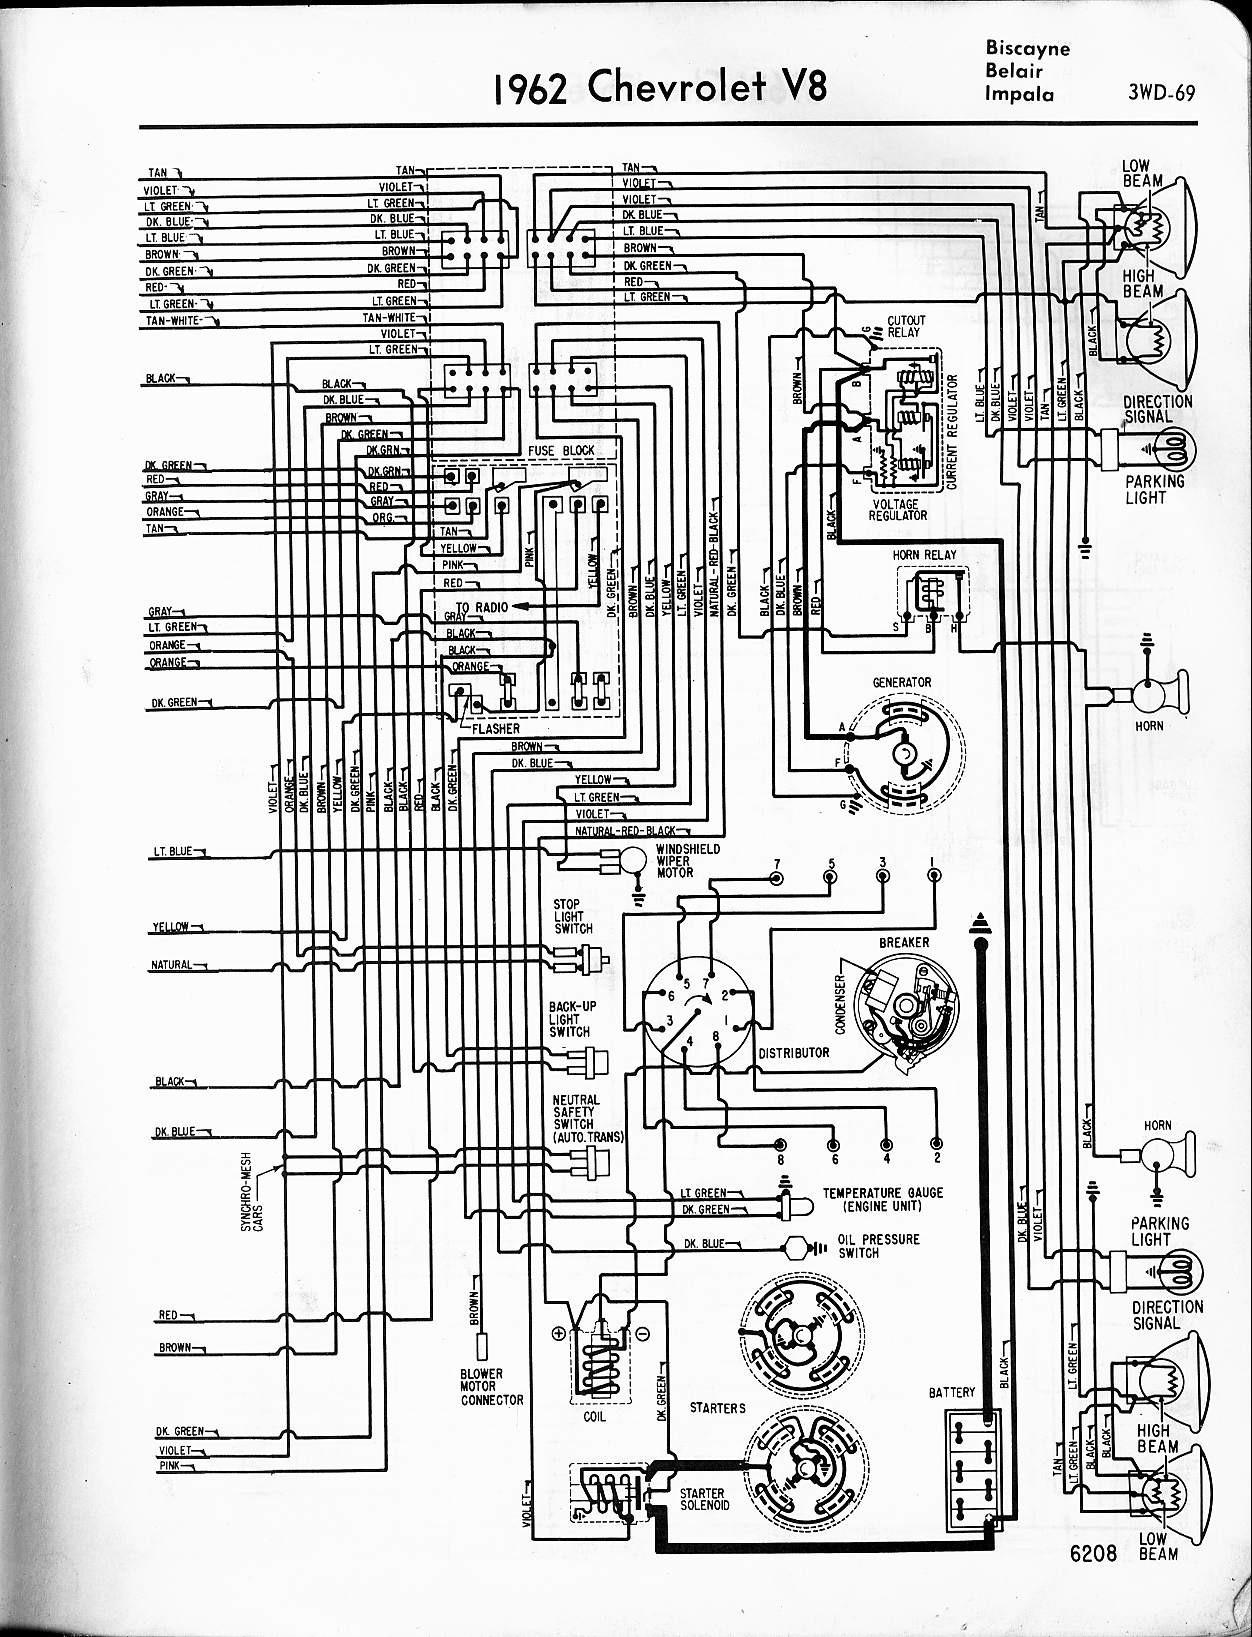 1964 Impala Ss Wiring Harness Diagram Schematics For 96 2002 Chevrolet Chevy Sedan Engine